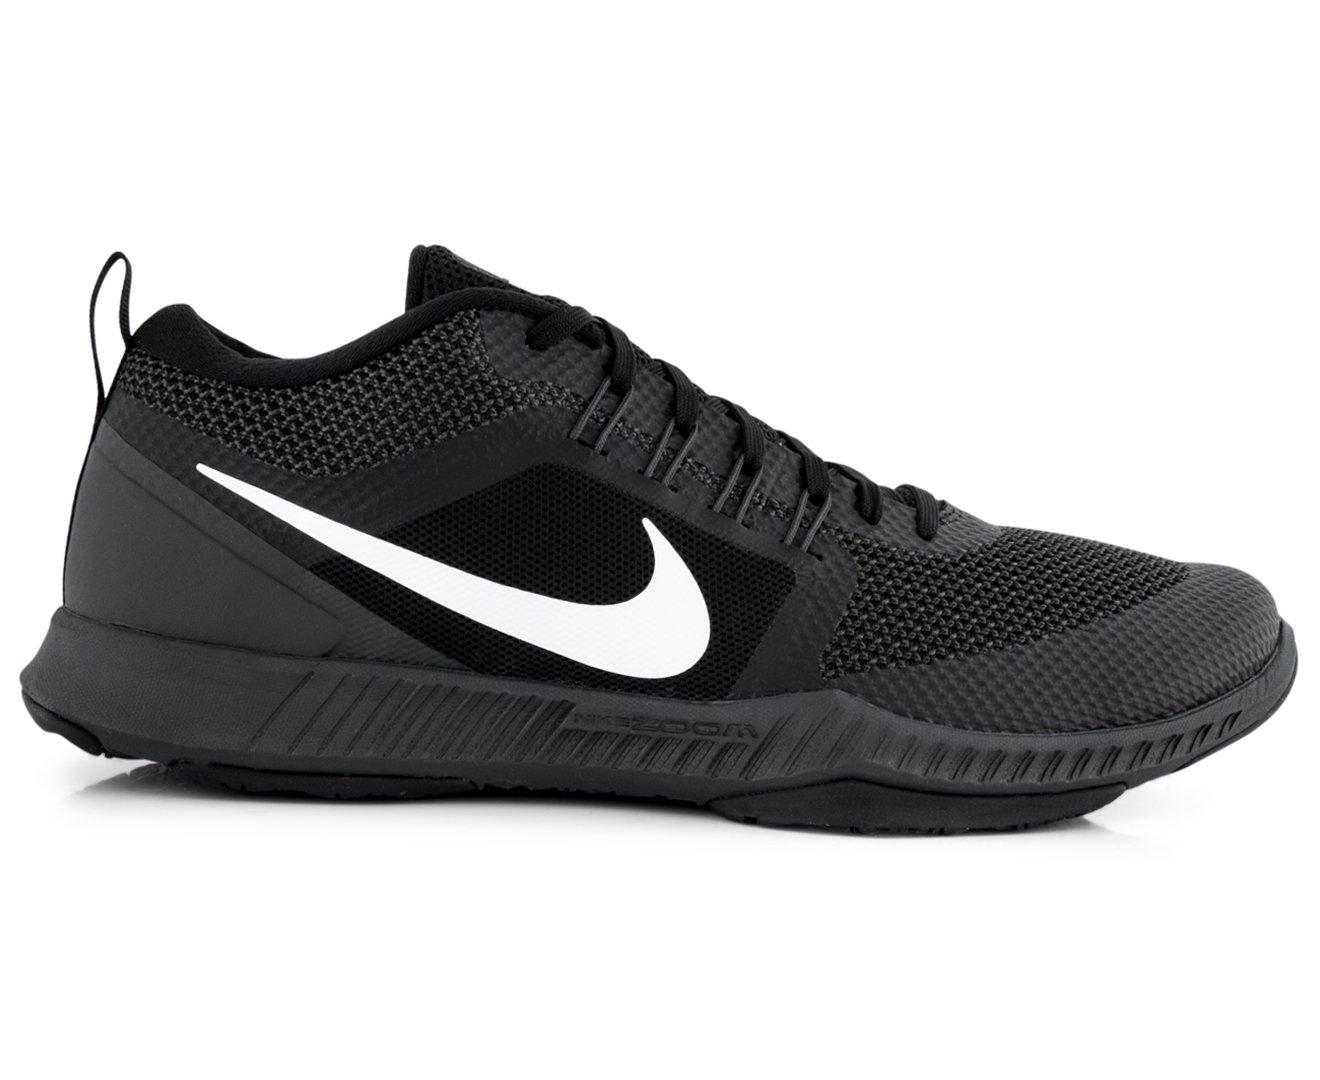 4b4521ffacb8 Galleon - Nike Mens Zoom Domination Cross Training Shoes Black Anthracite  White 917708-001 Size 10